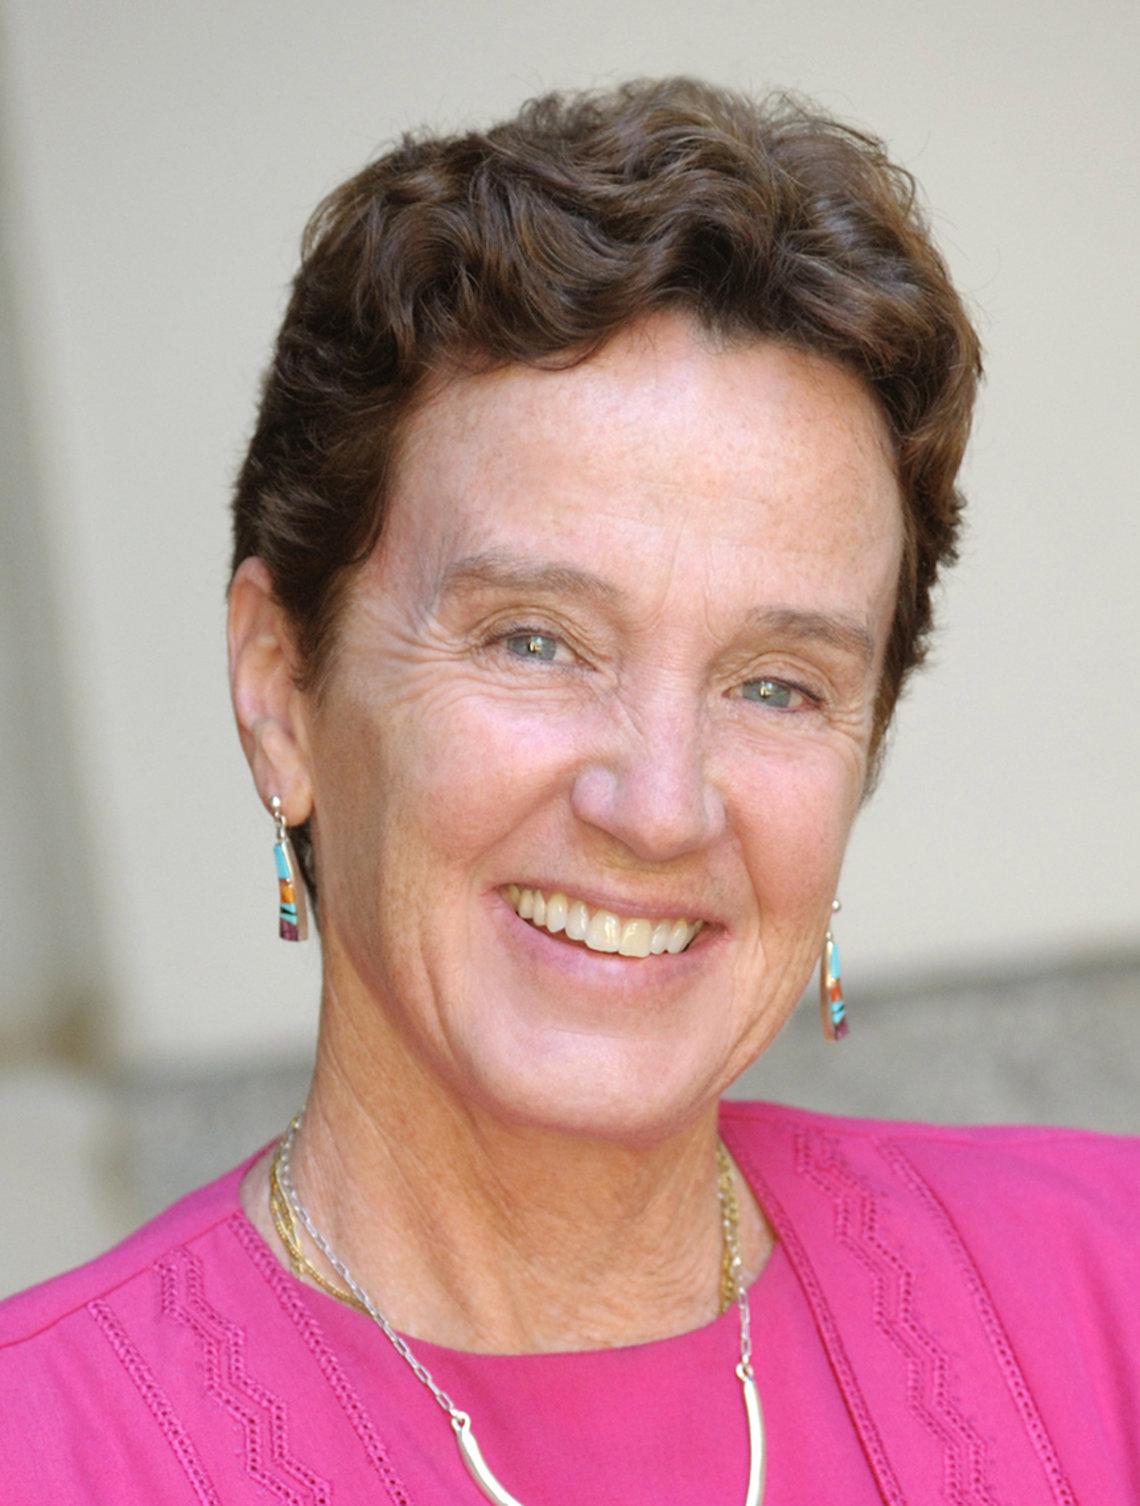 Dr. Christine Grady